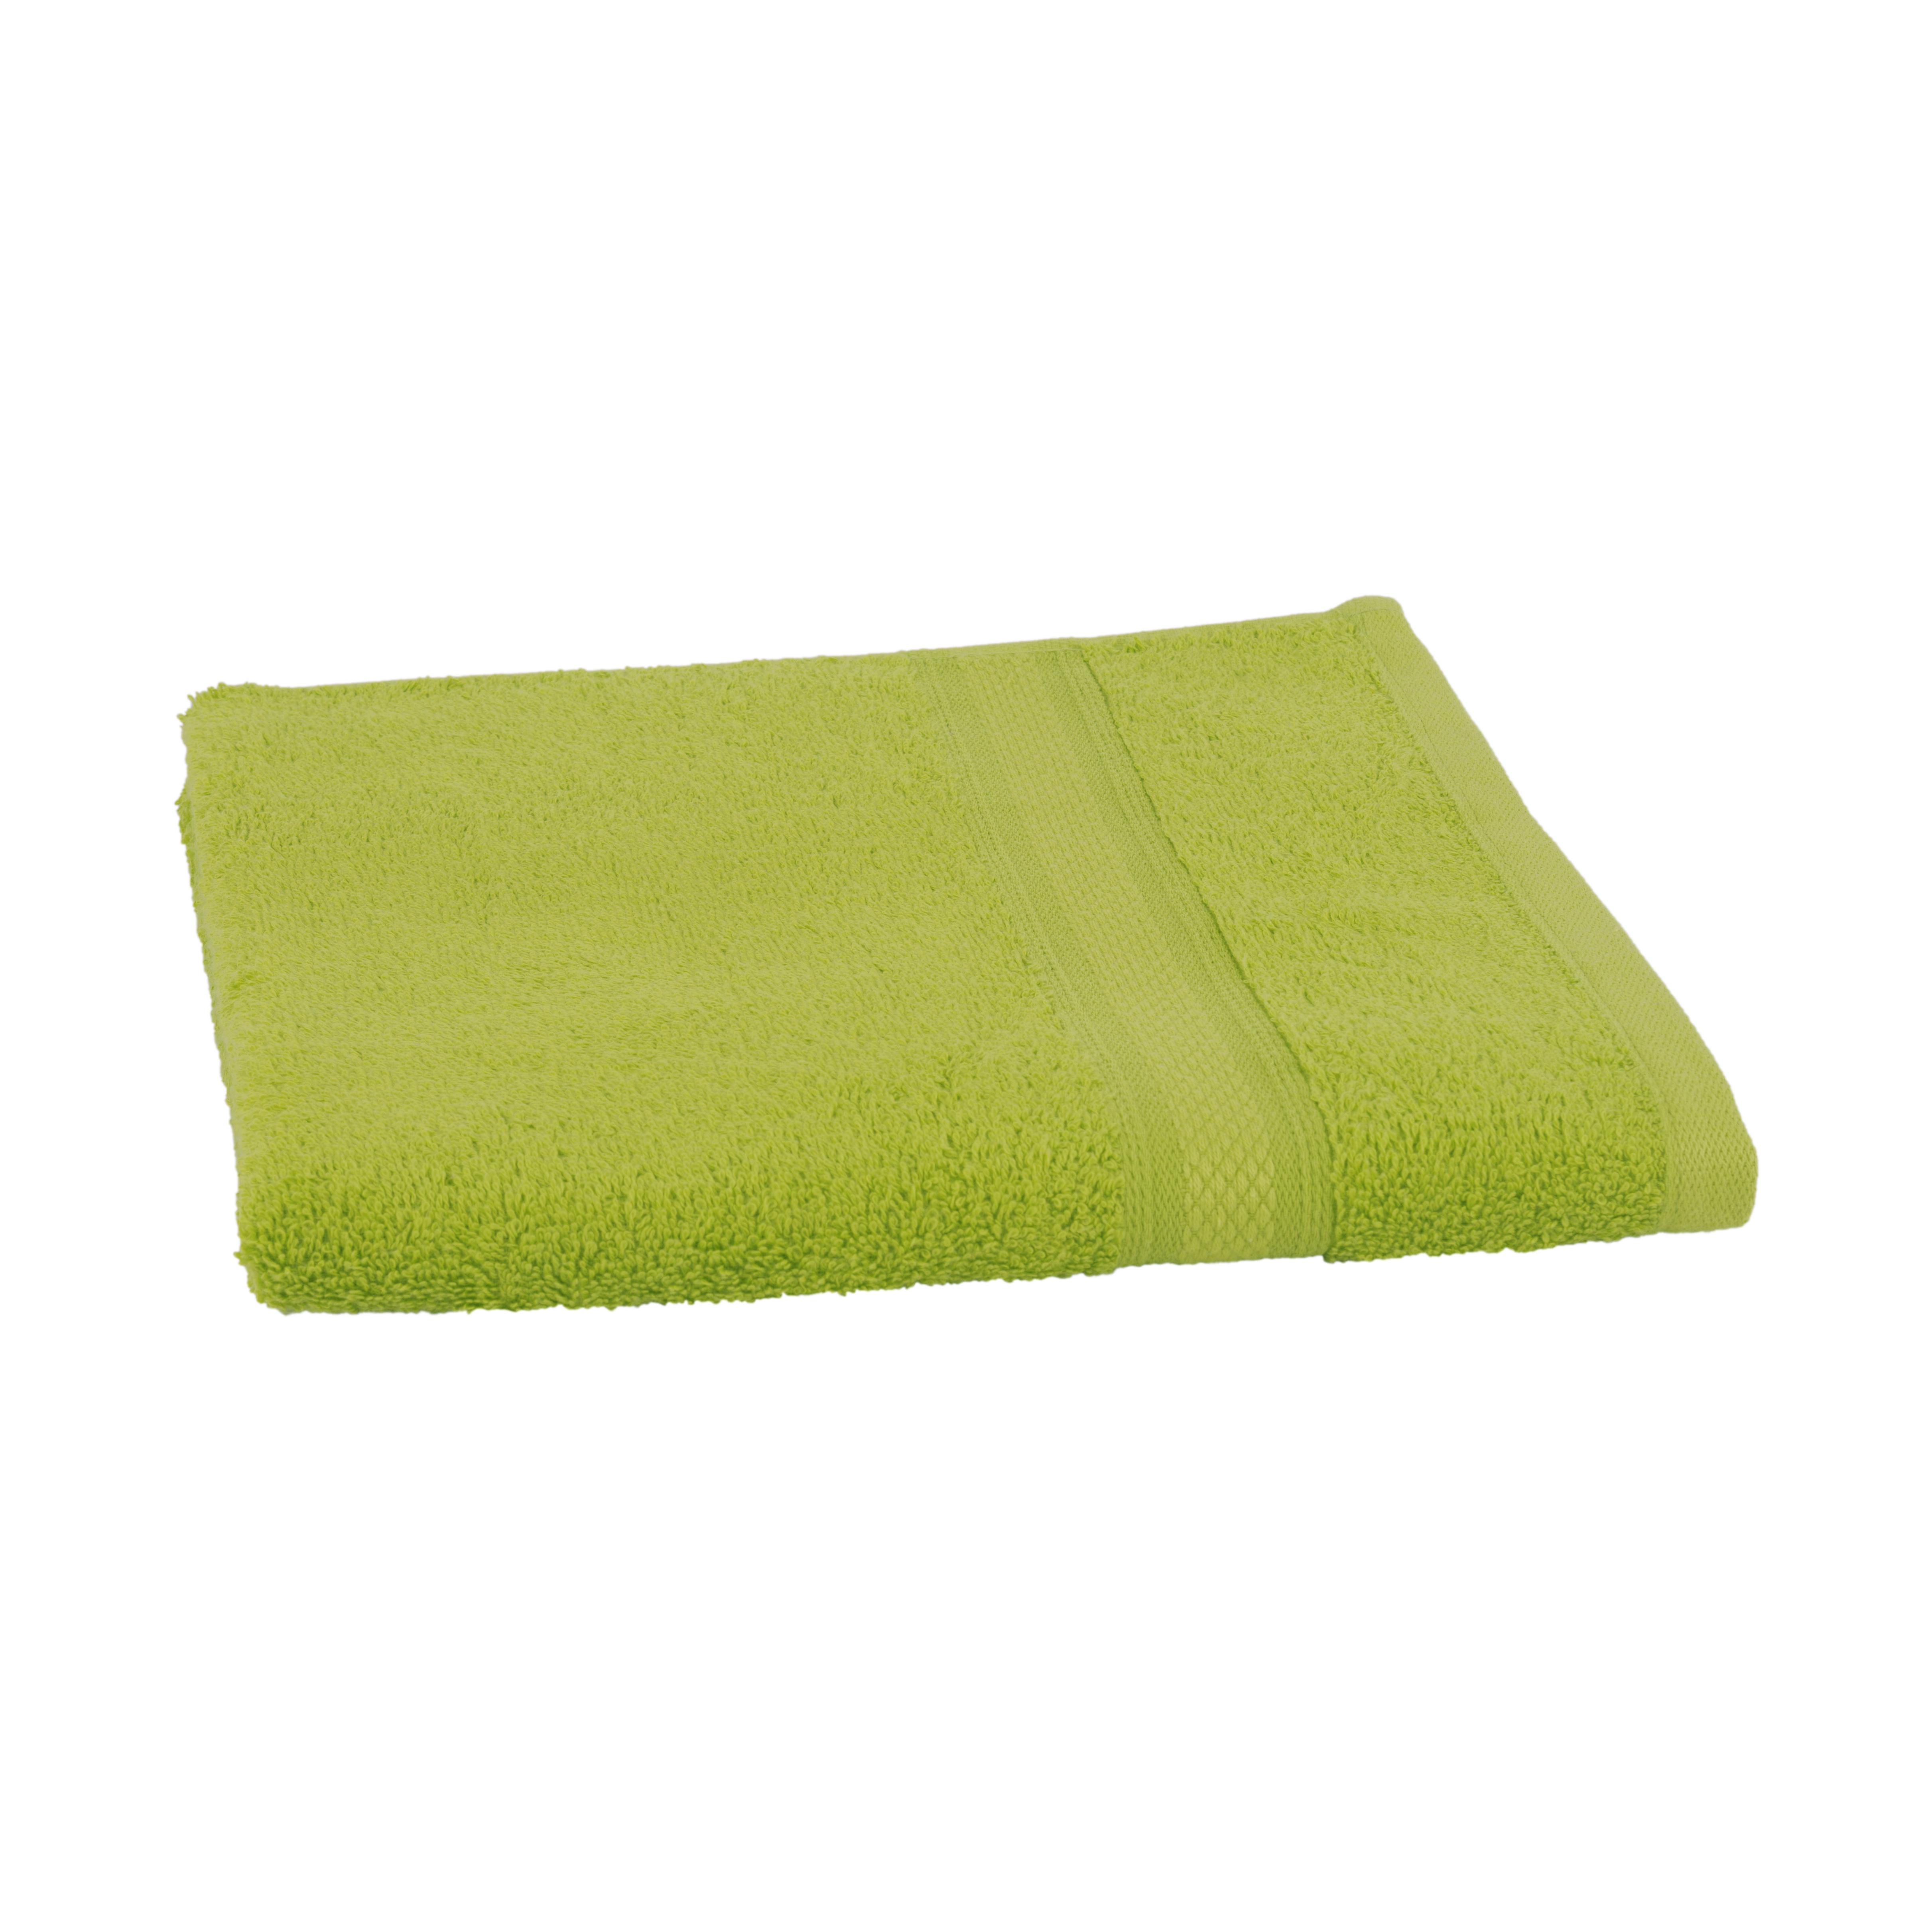 Clarysse Elegance Handdoek 60x110 500gram Groen